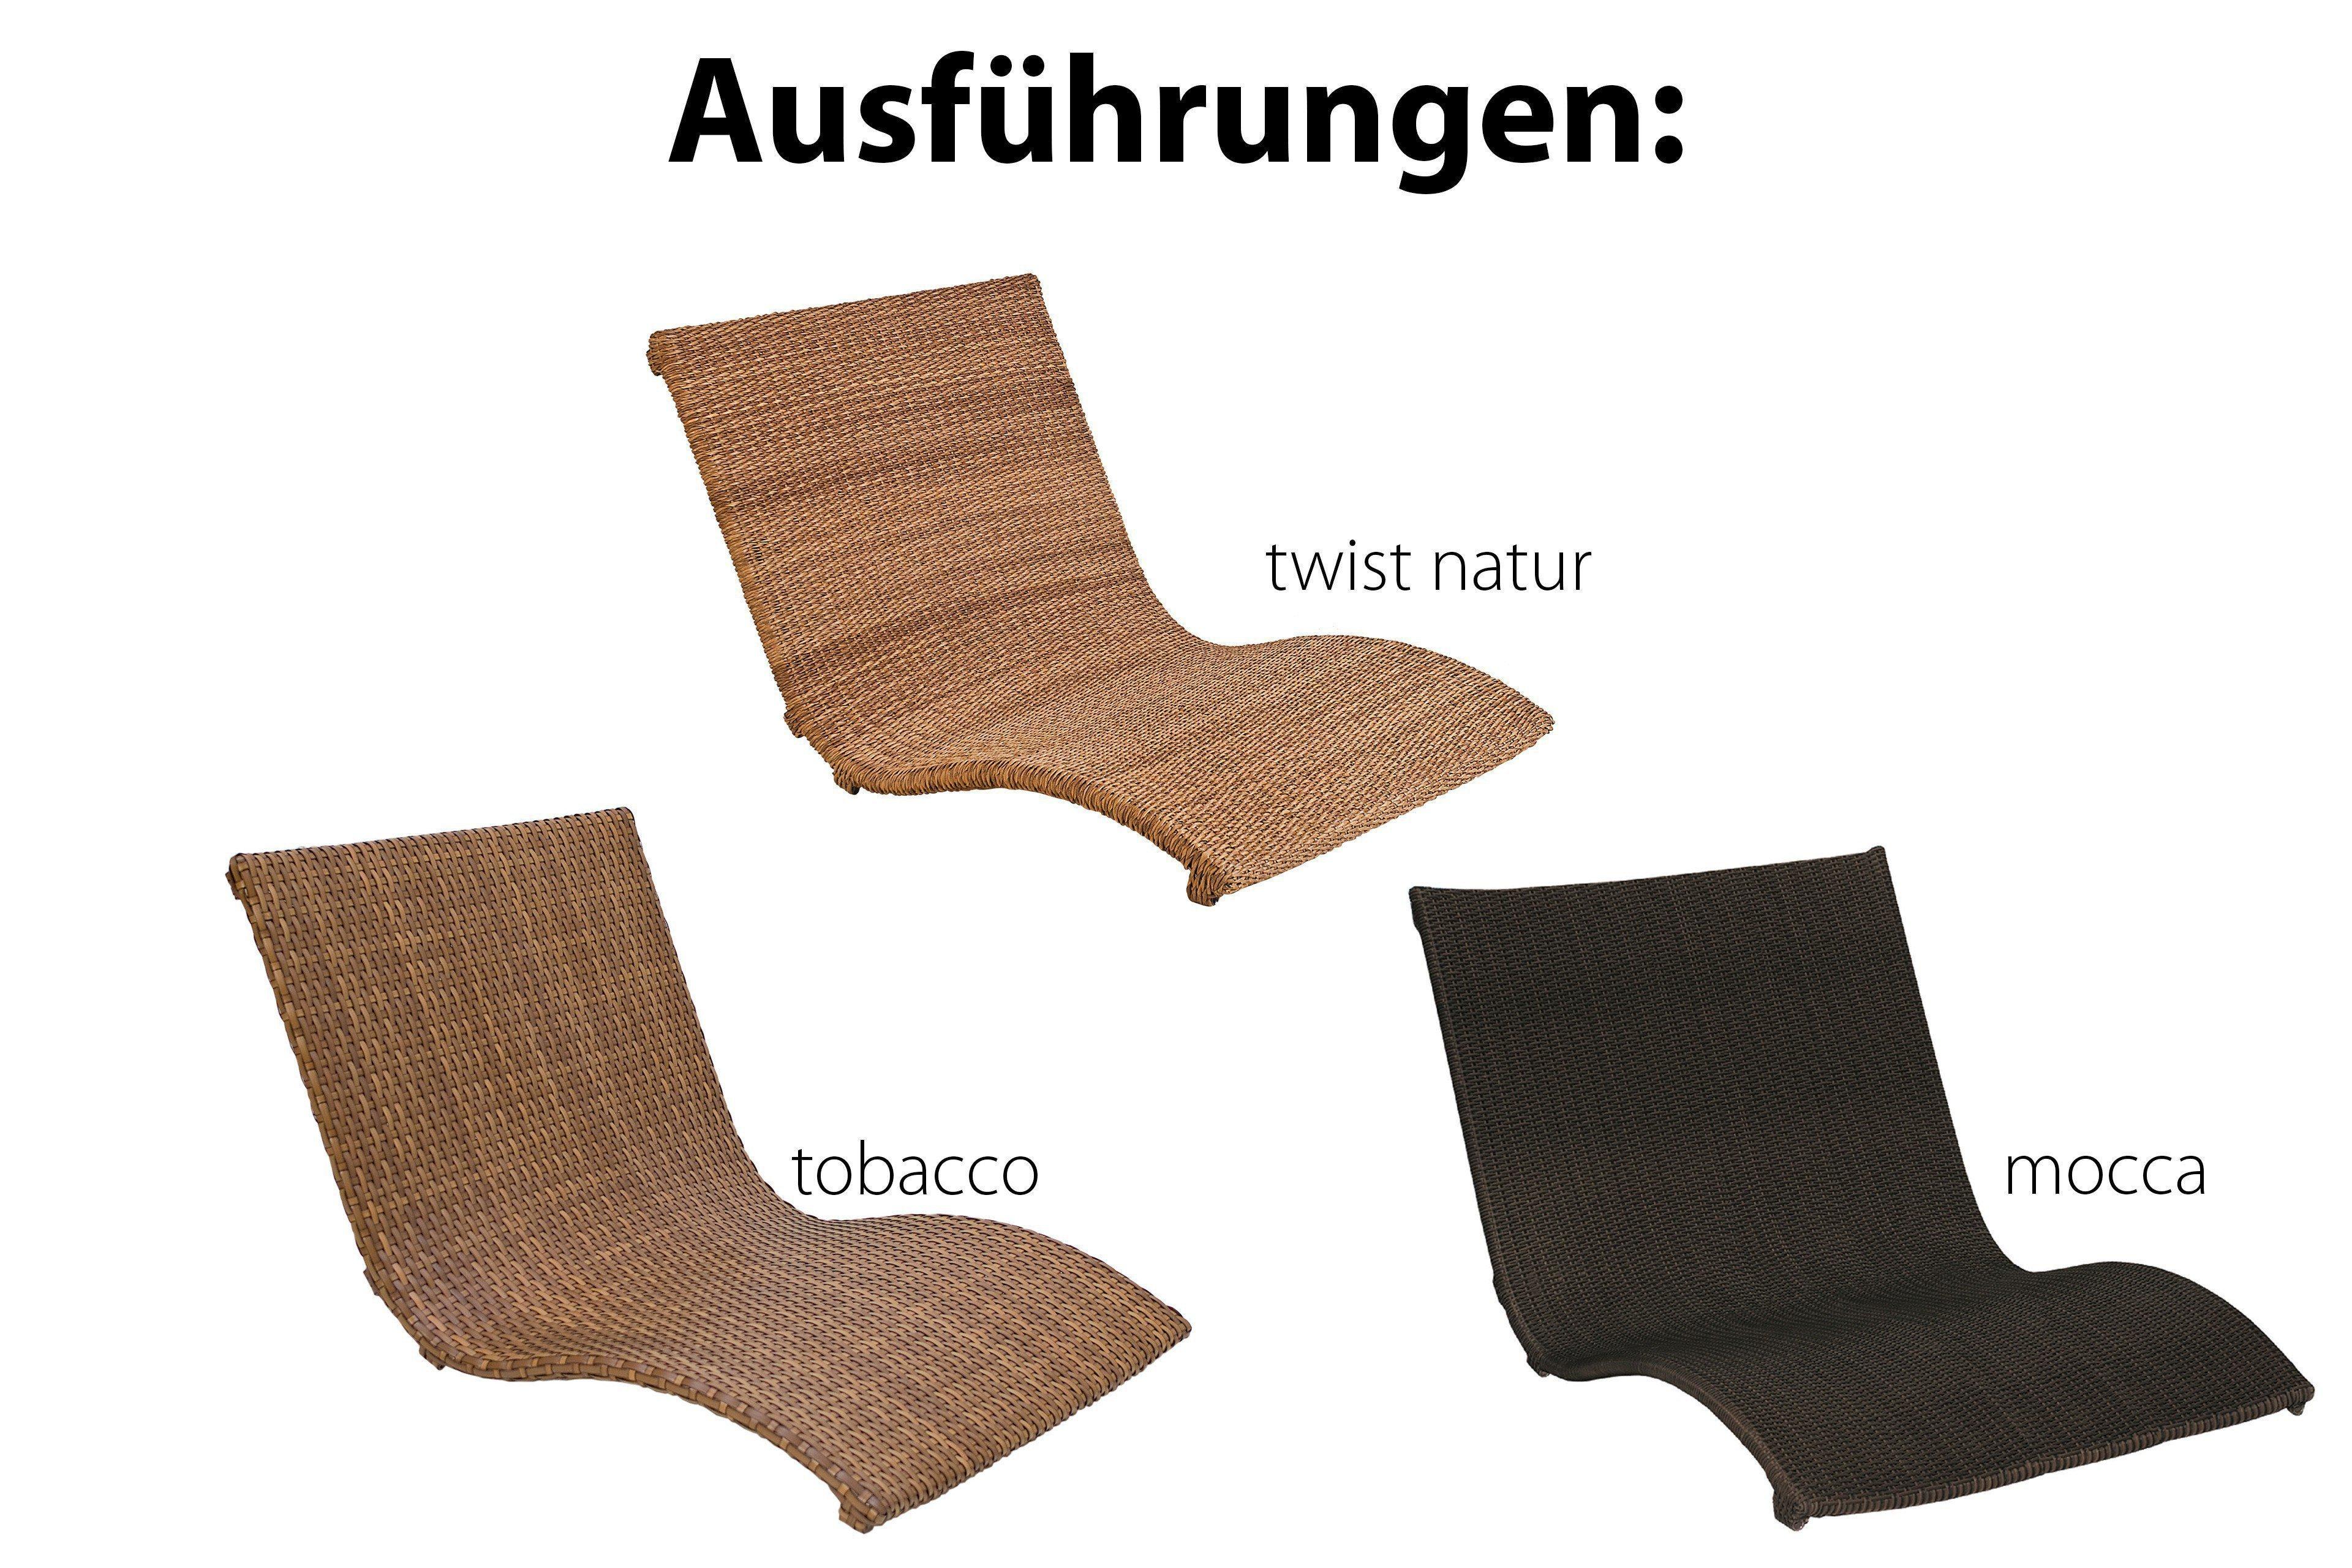 mbm doppelliege heaven swing twist natur m bel letz ihr online shop. Black Bedroom Furniture Sets. Home Design Ideas